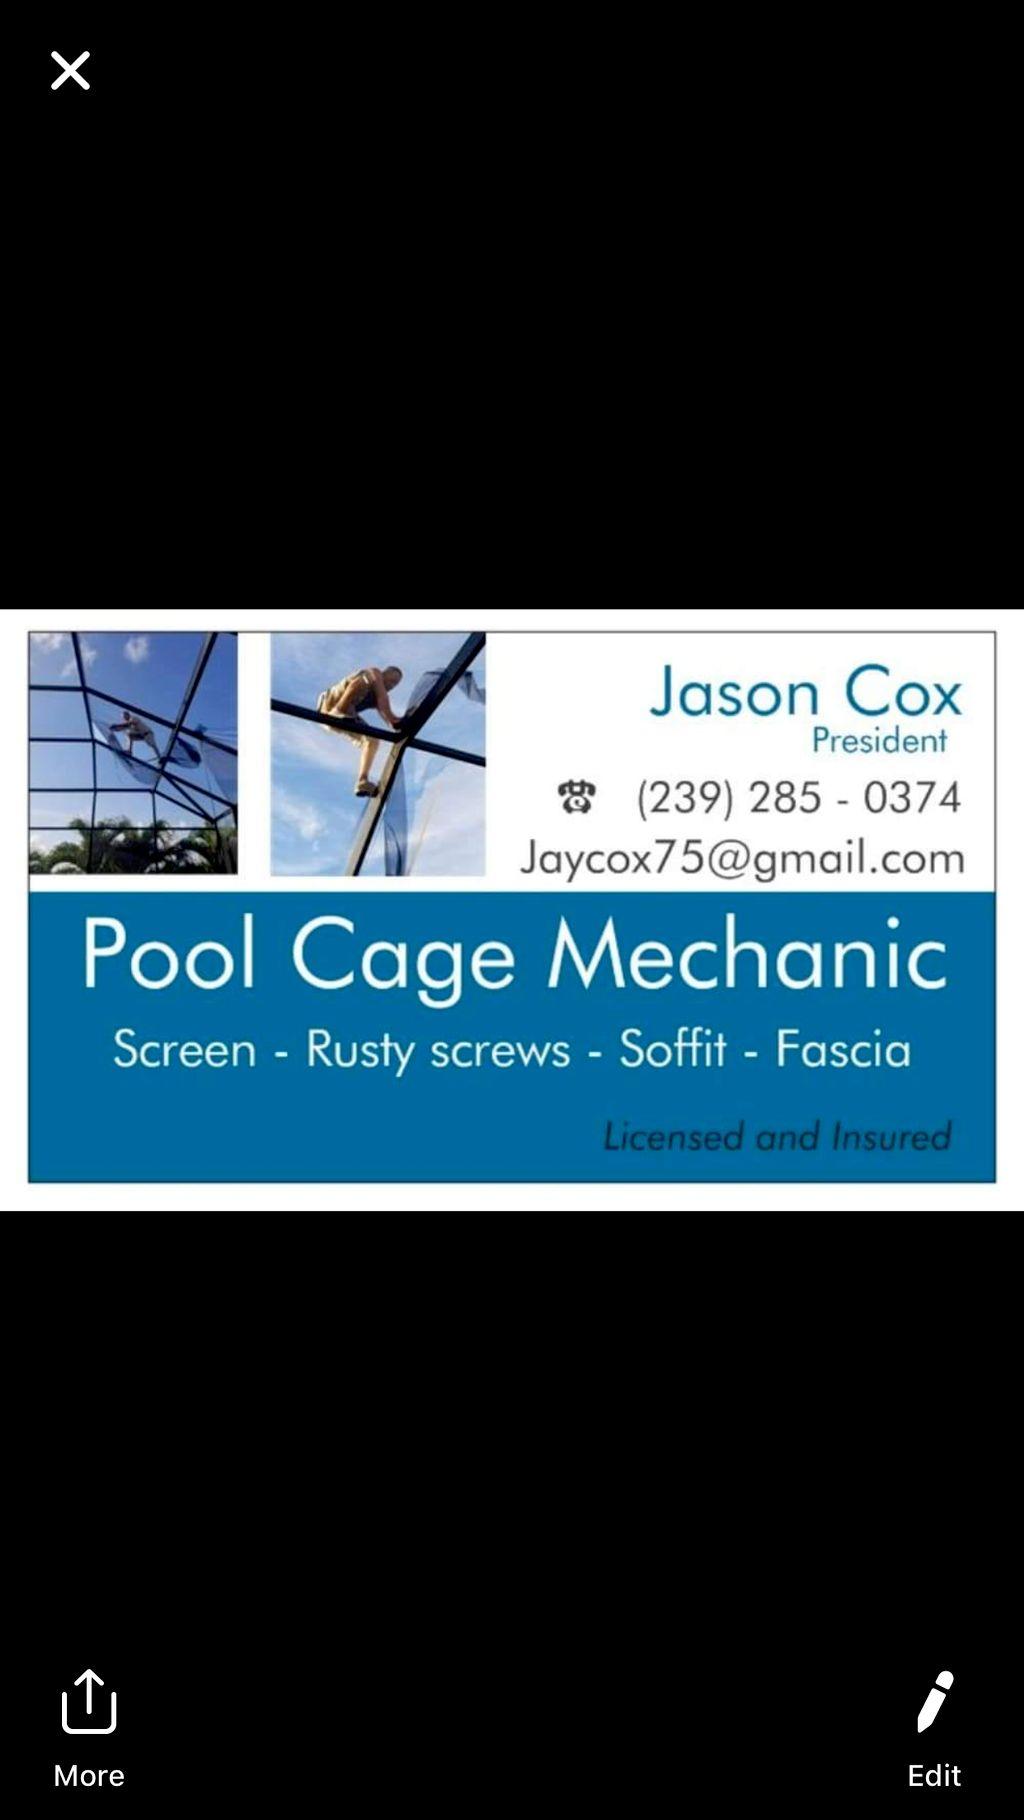 Pool cage mechanic